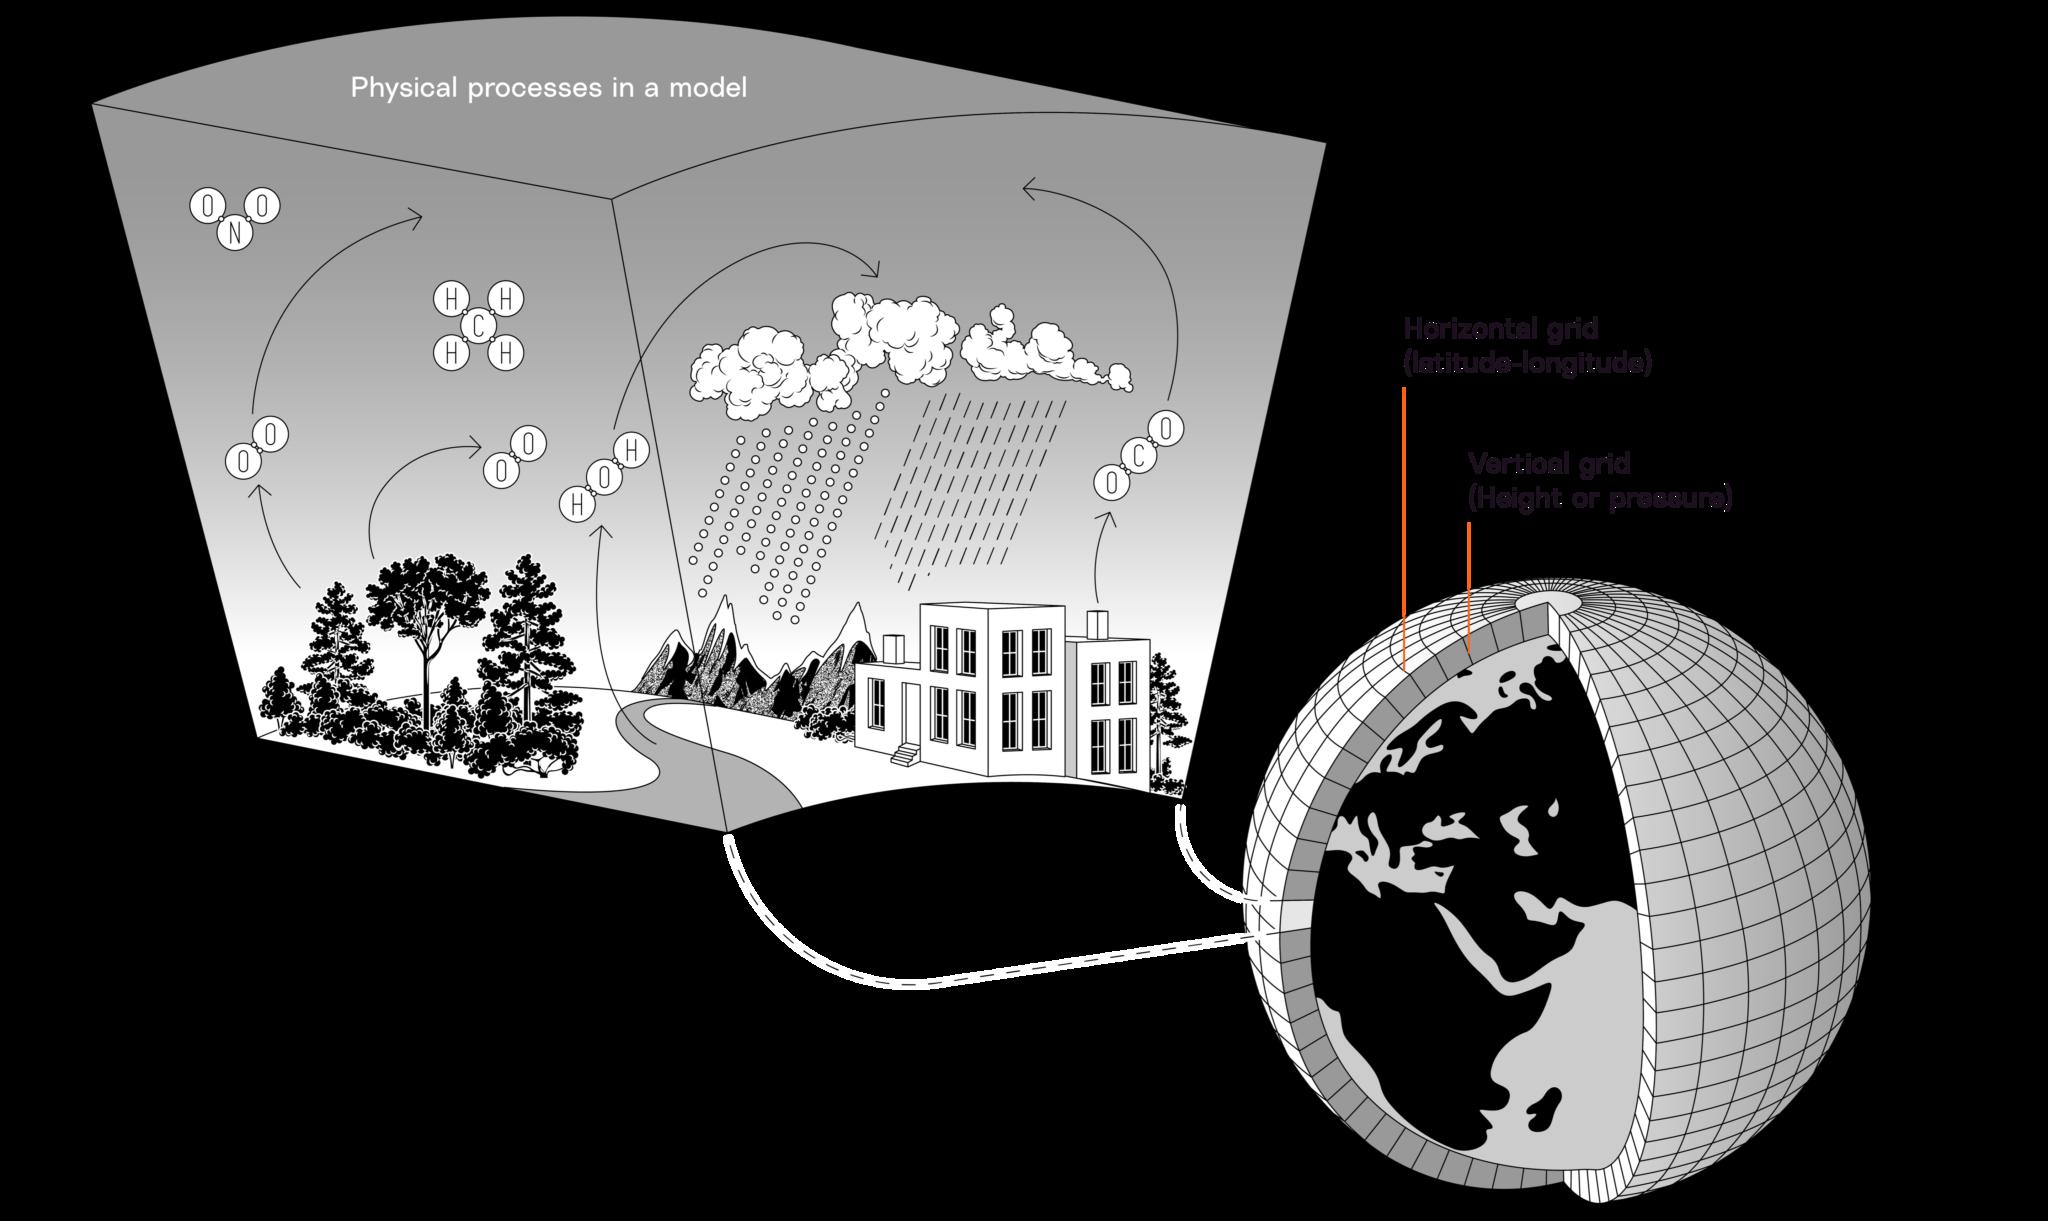 Illustration of grid cells in a model